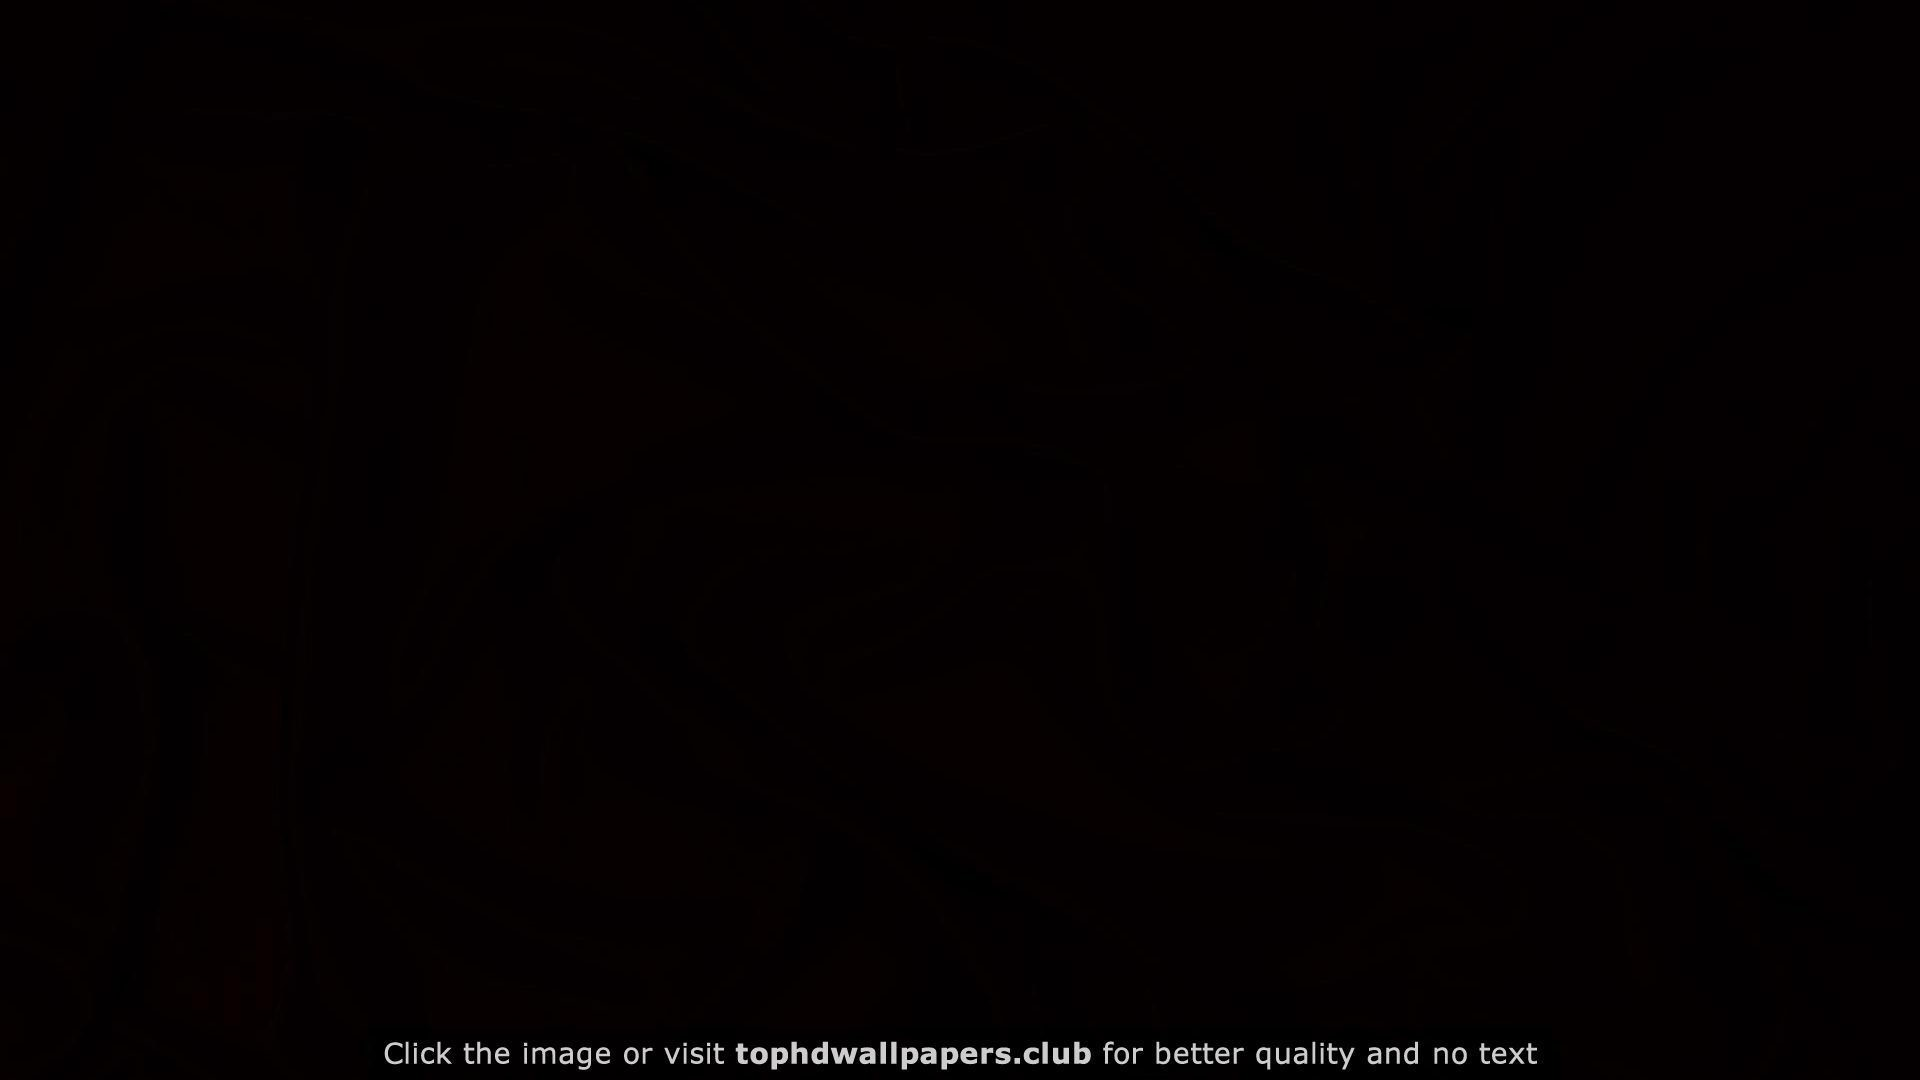 Dark Images Wallpaper 72 Pictures